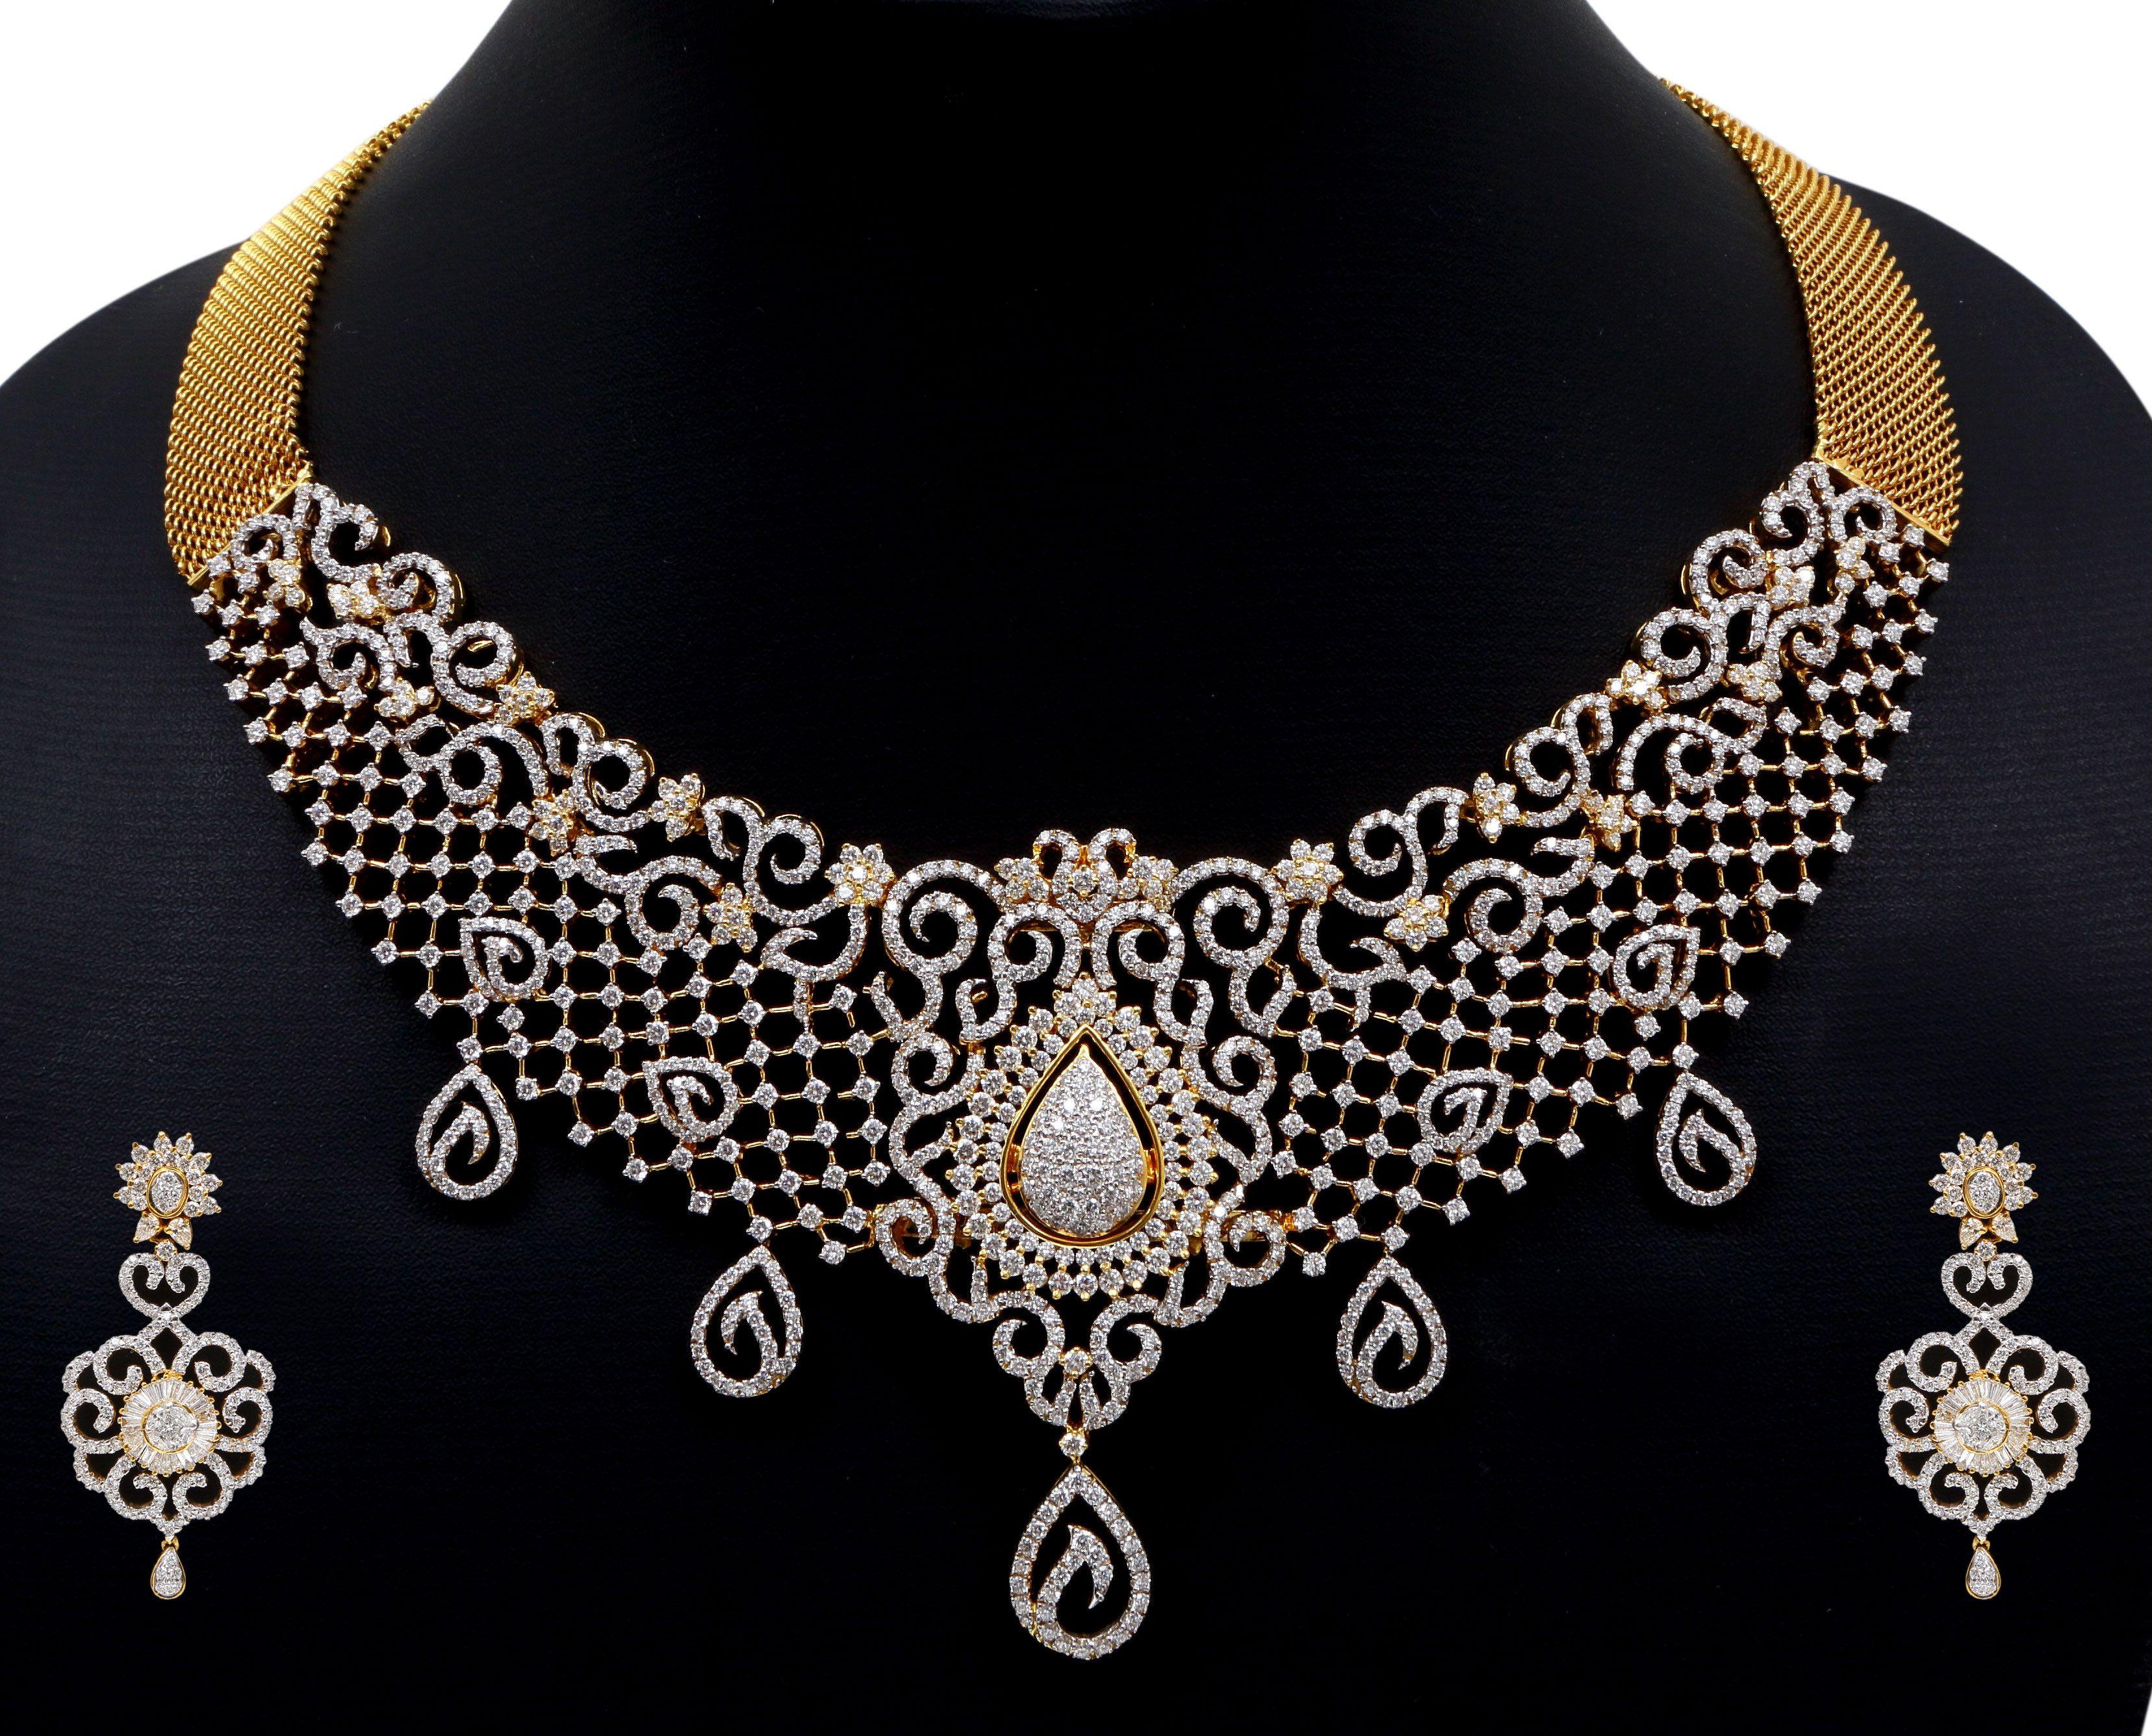 Indian diamond necklacesdiamond necklace set indian diamond necklace